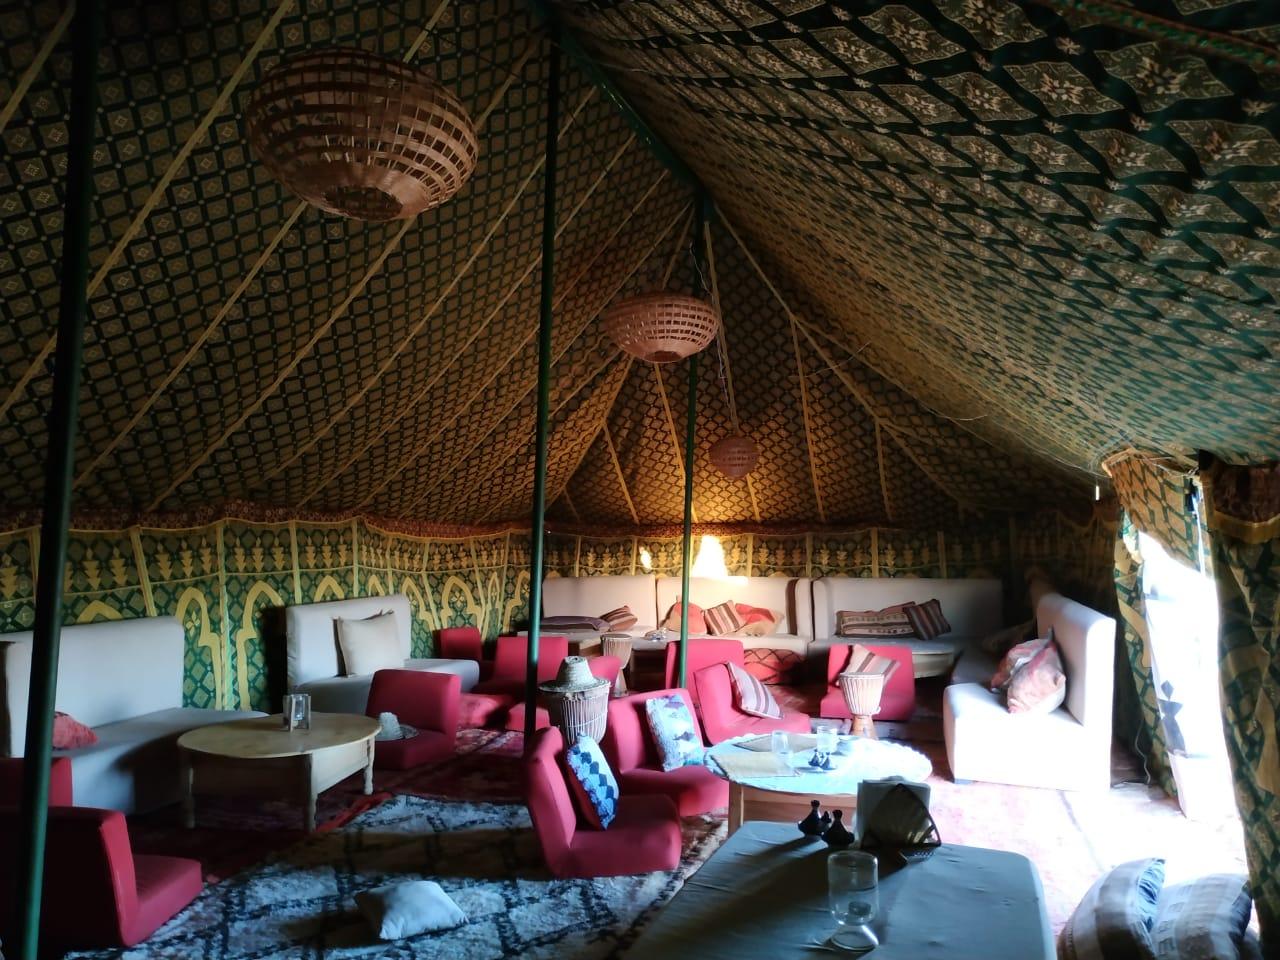 moroccan tent lining salon 2.jpg